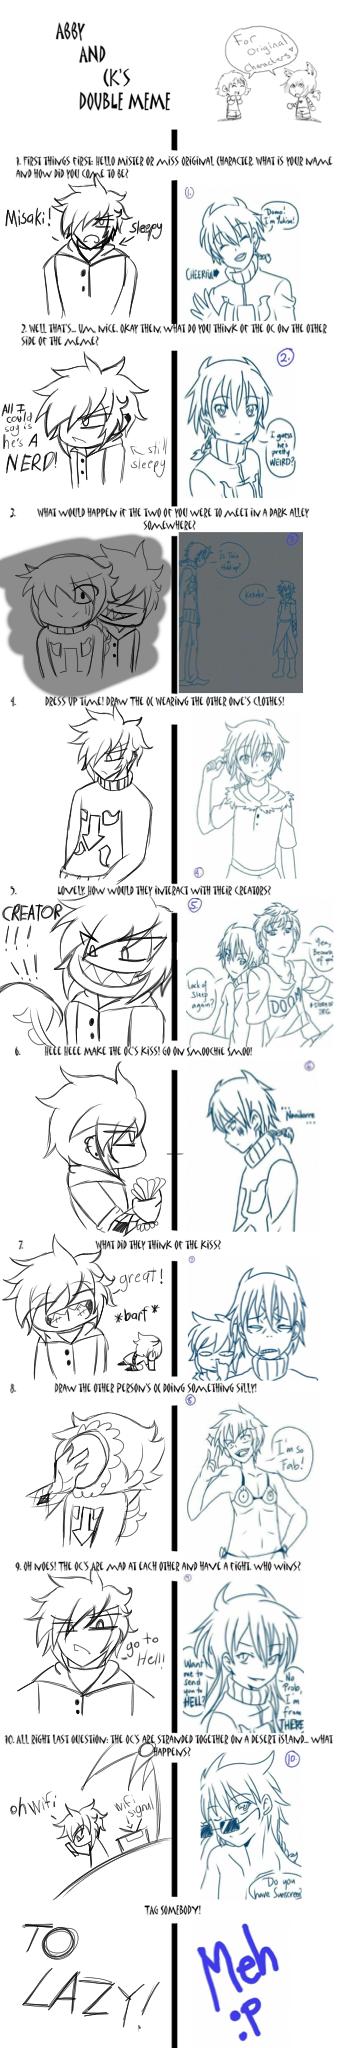 OC Double meme with Pan-chan by yukisnishika